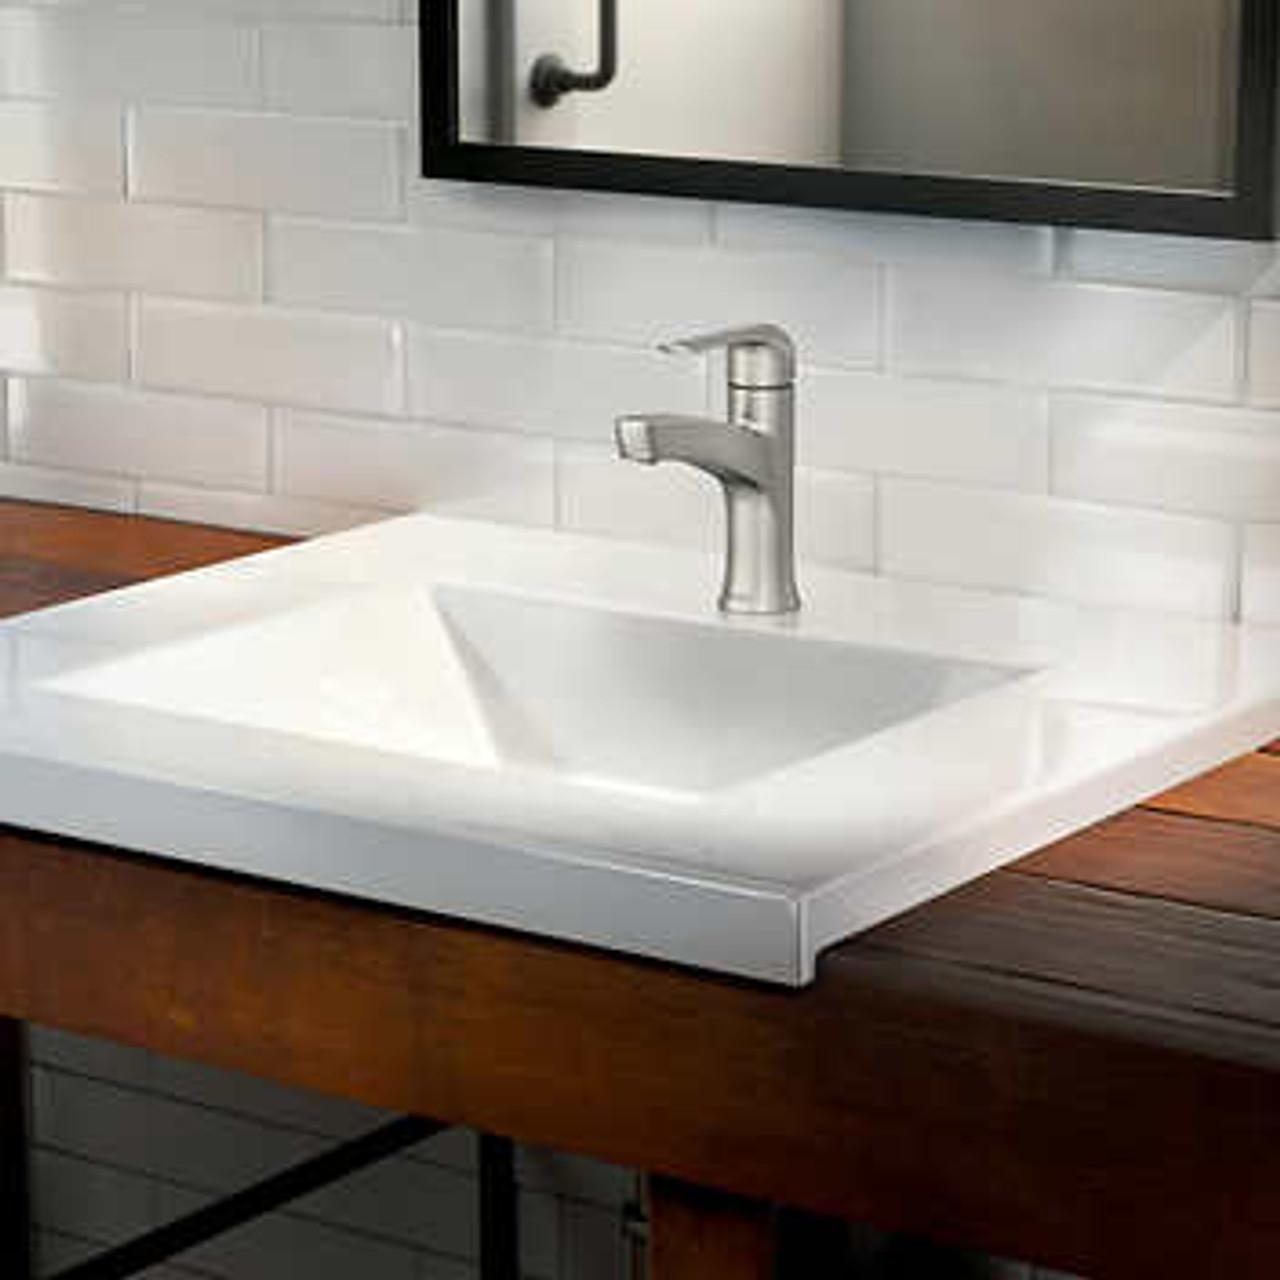 moen tilson single handle bathroom faucet in brushed nickel